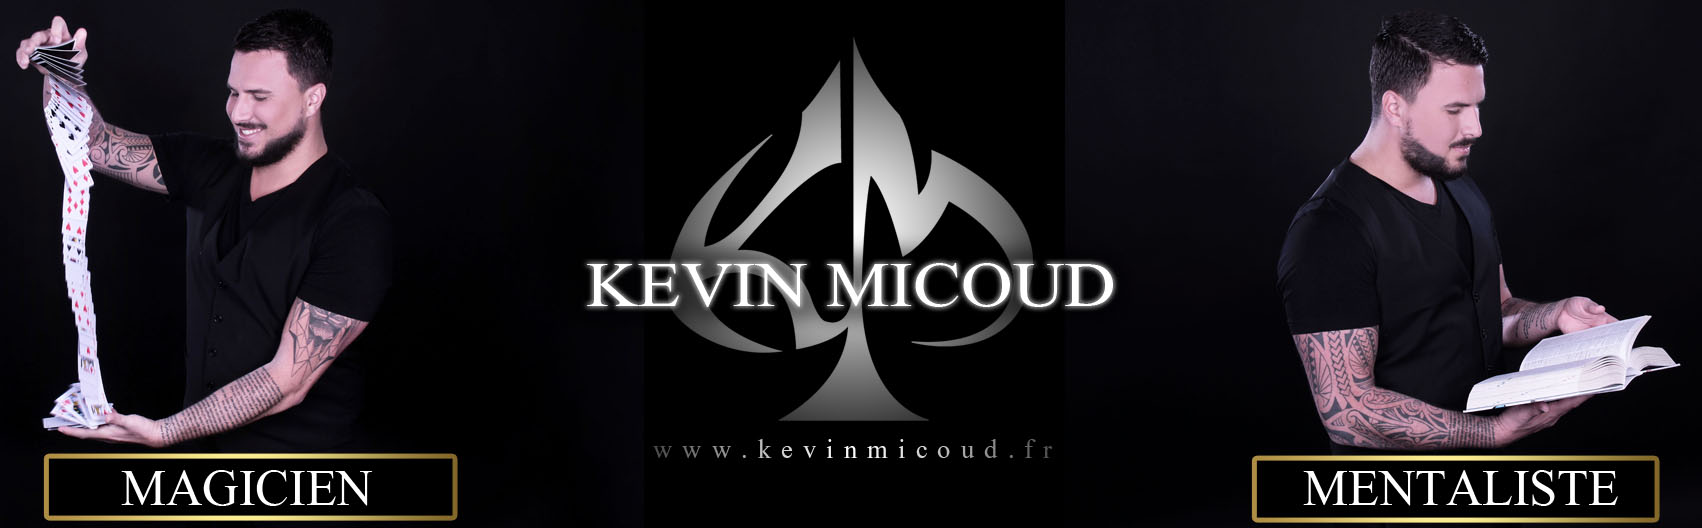 KEVIN MICOUD Magicien Mentaliste Grenoble Lyon